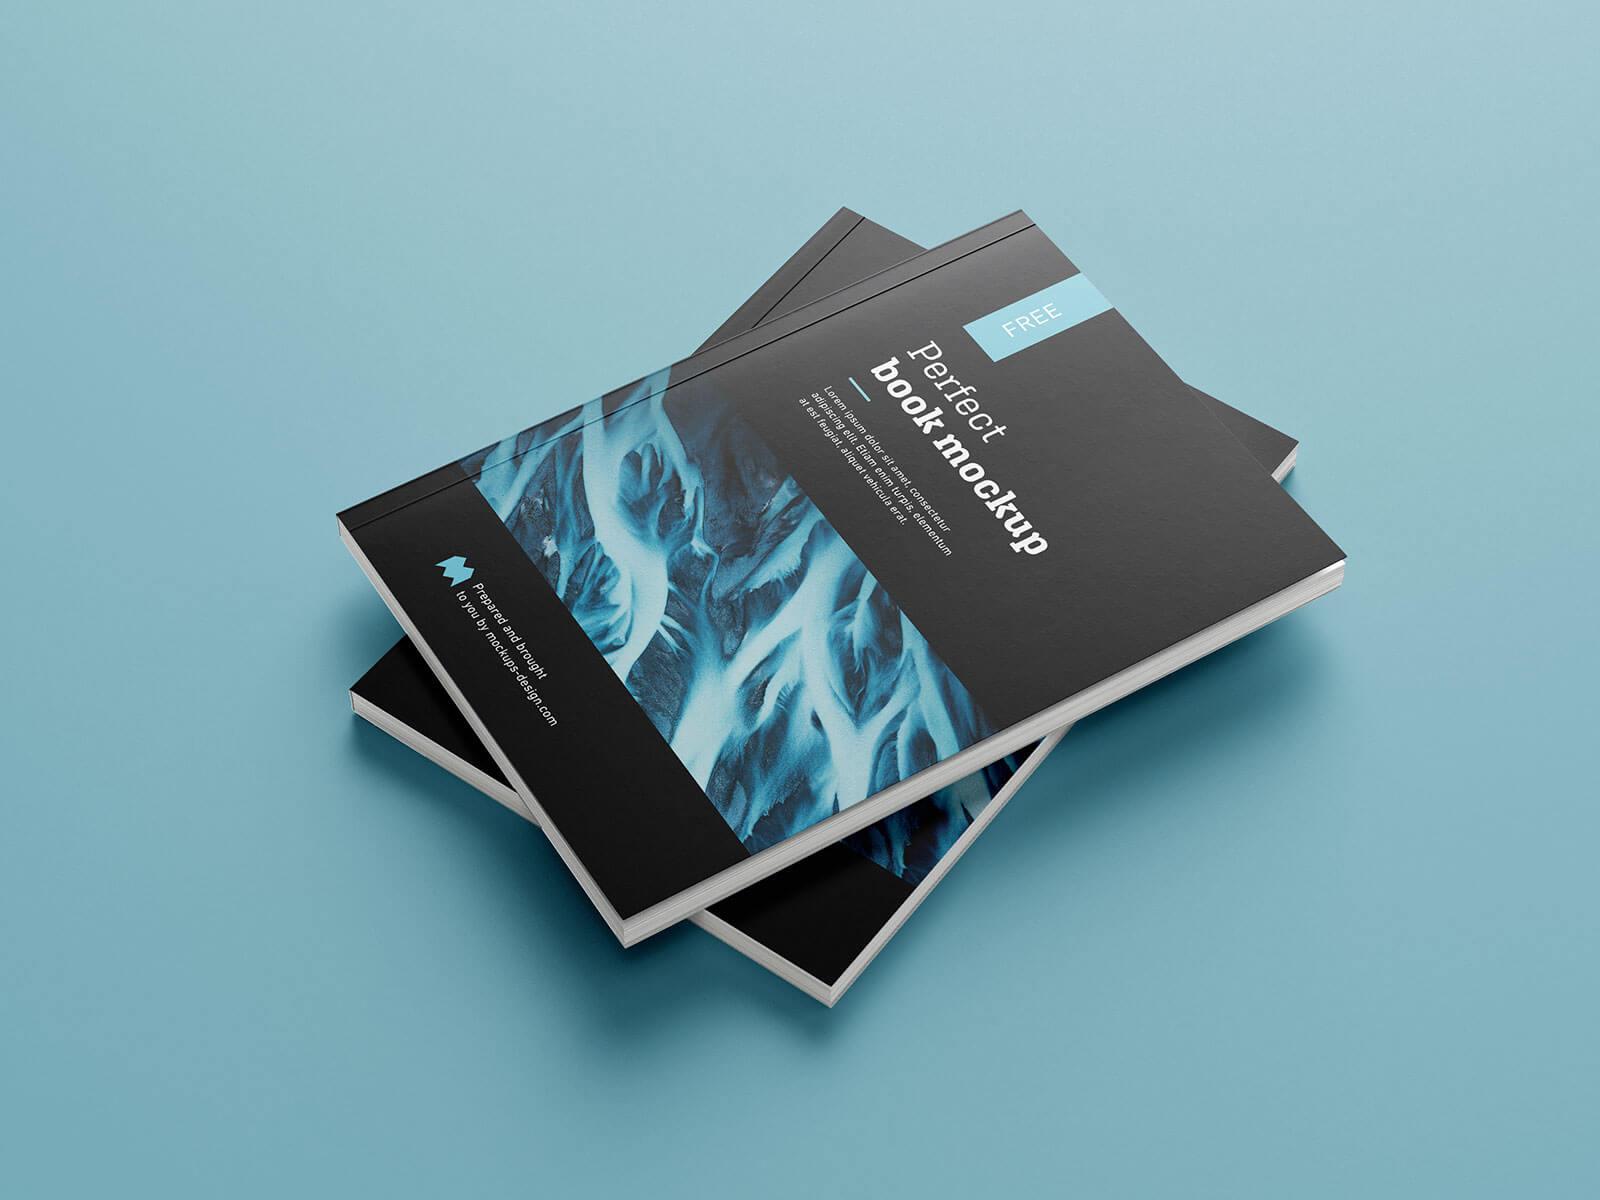 Free Premium Paperback Book Mockup PSD Set